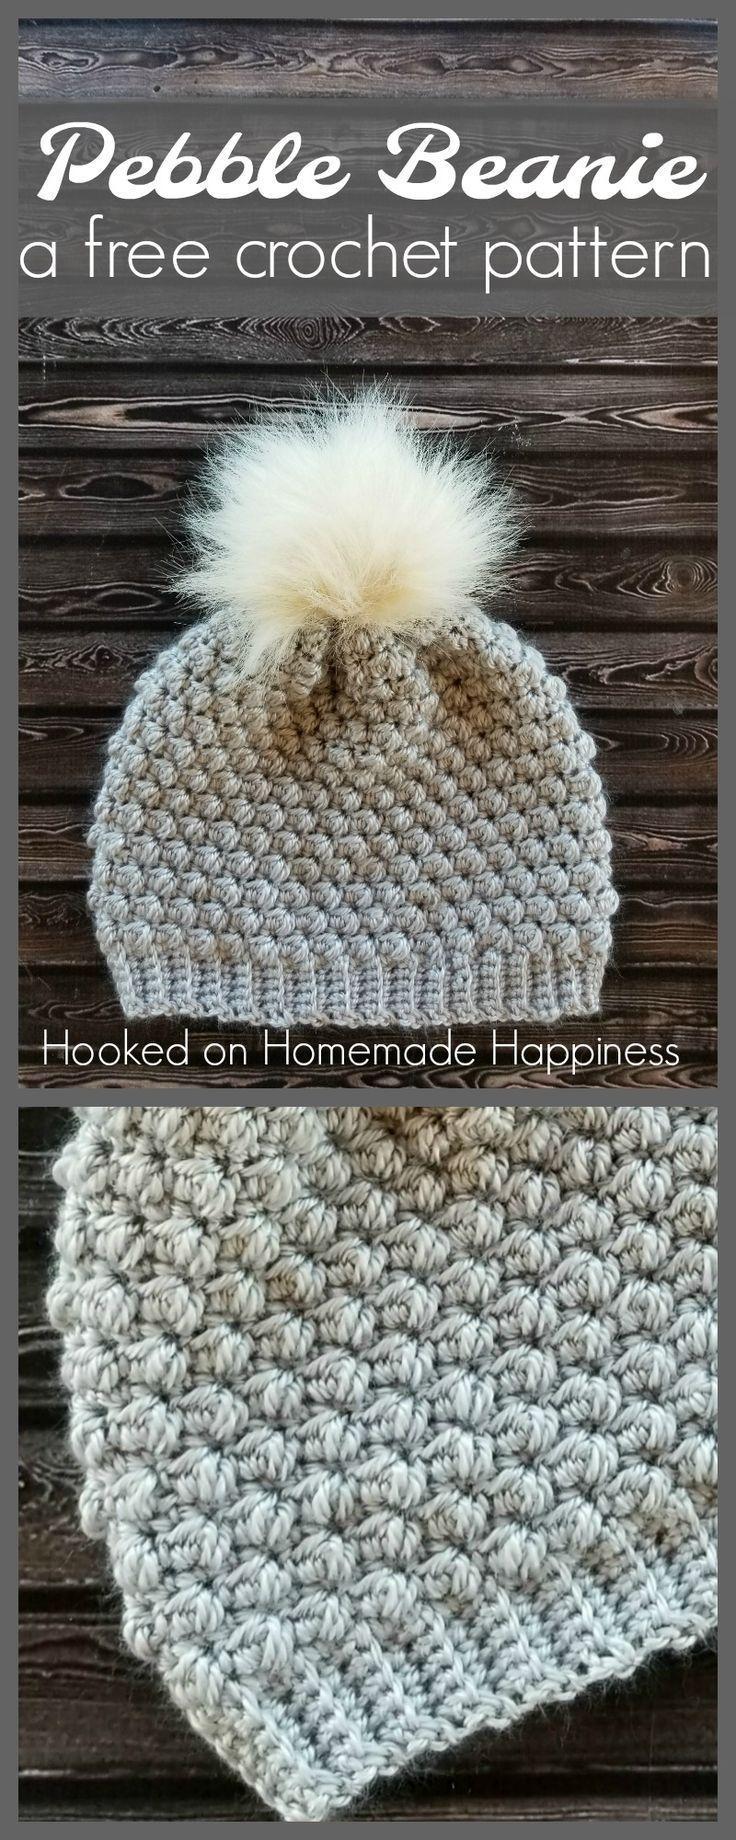 This crochet puff stitch beanie is so adorable! I love fur pom pom. Free crochet pattern!